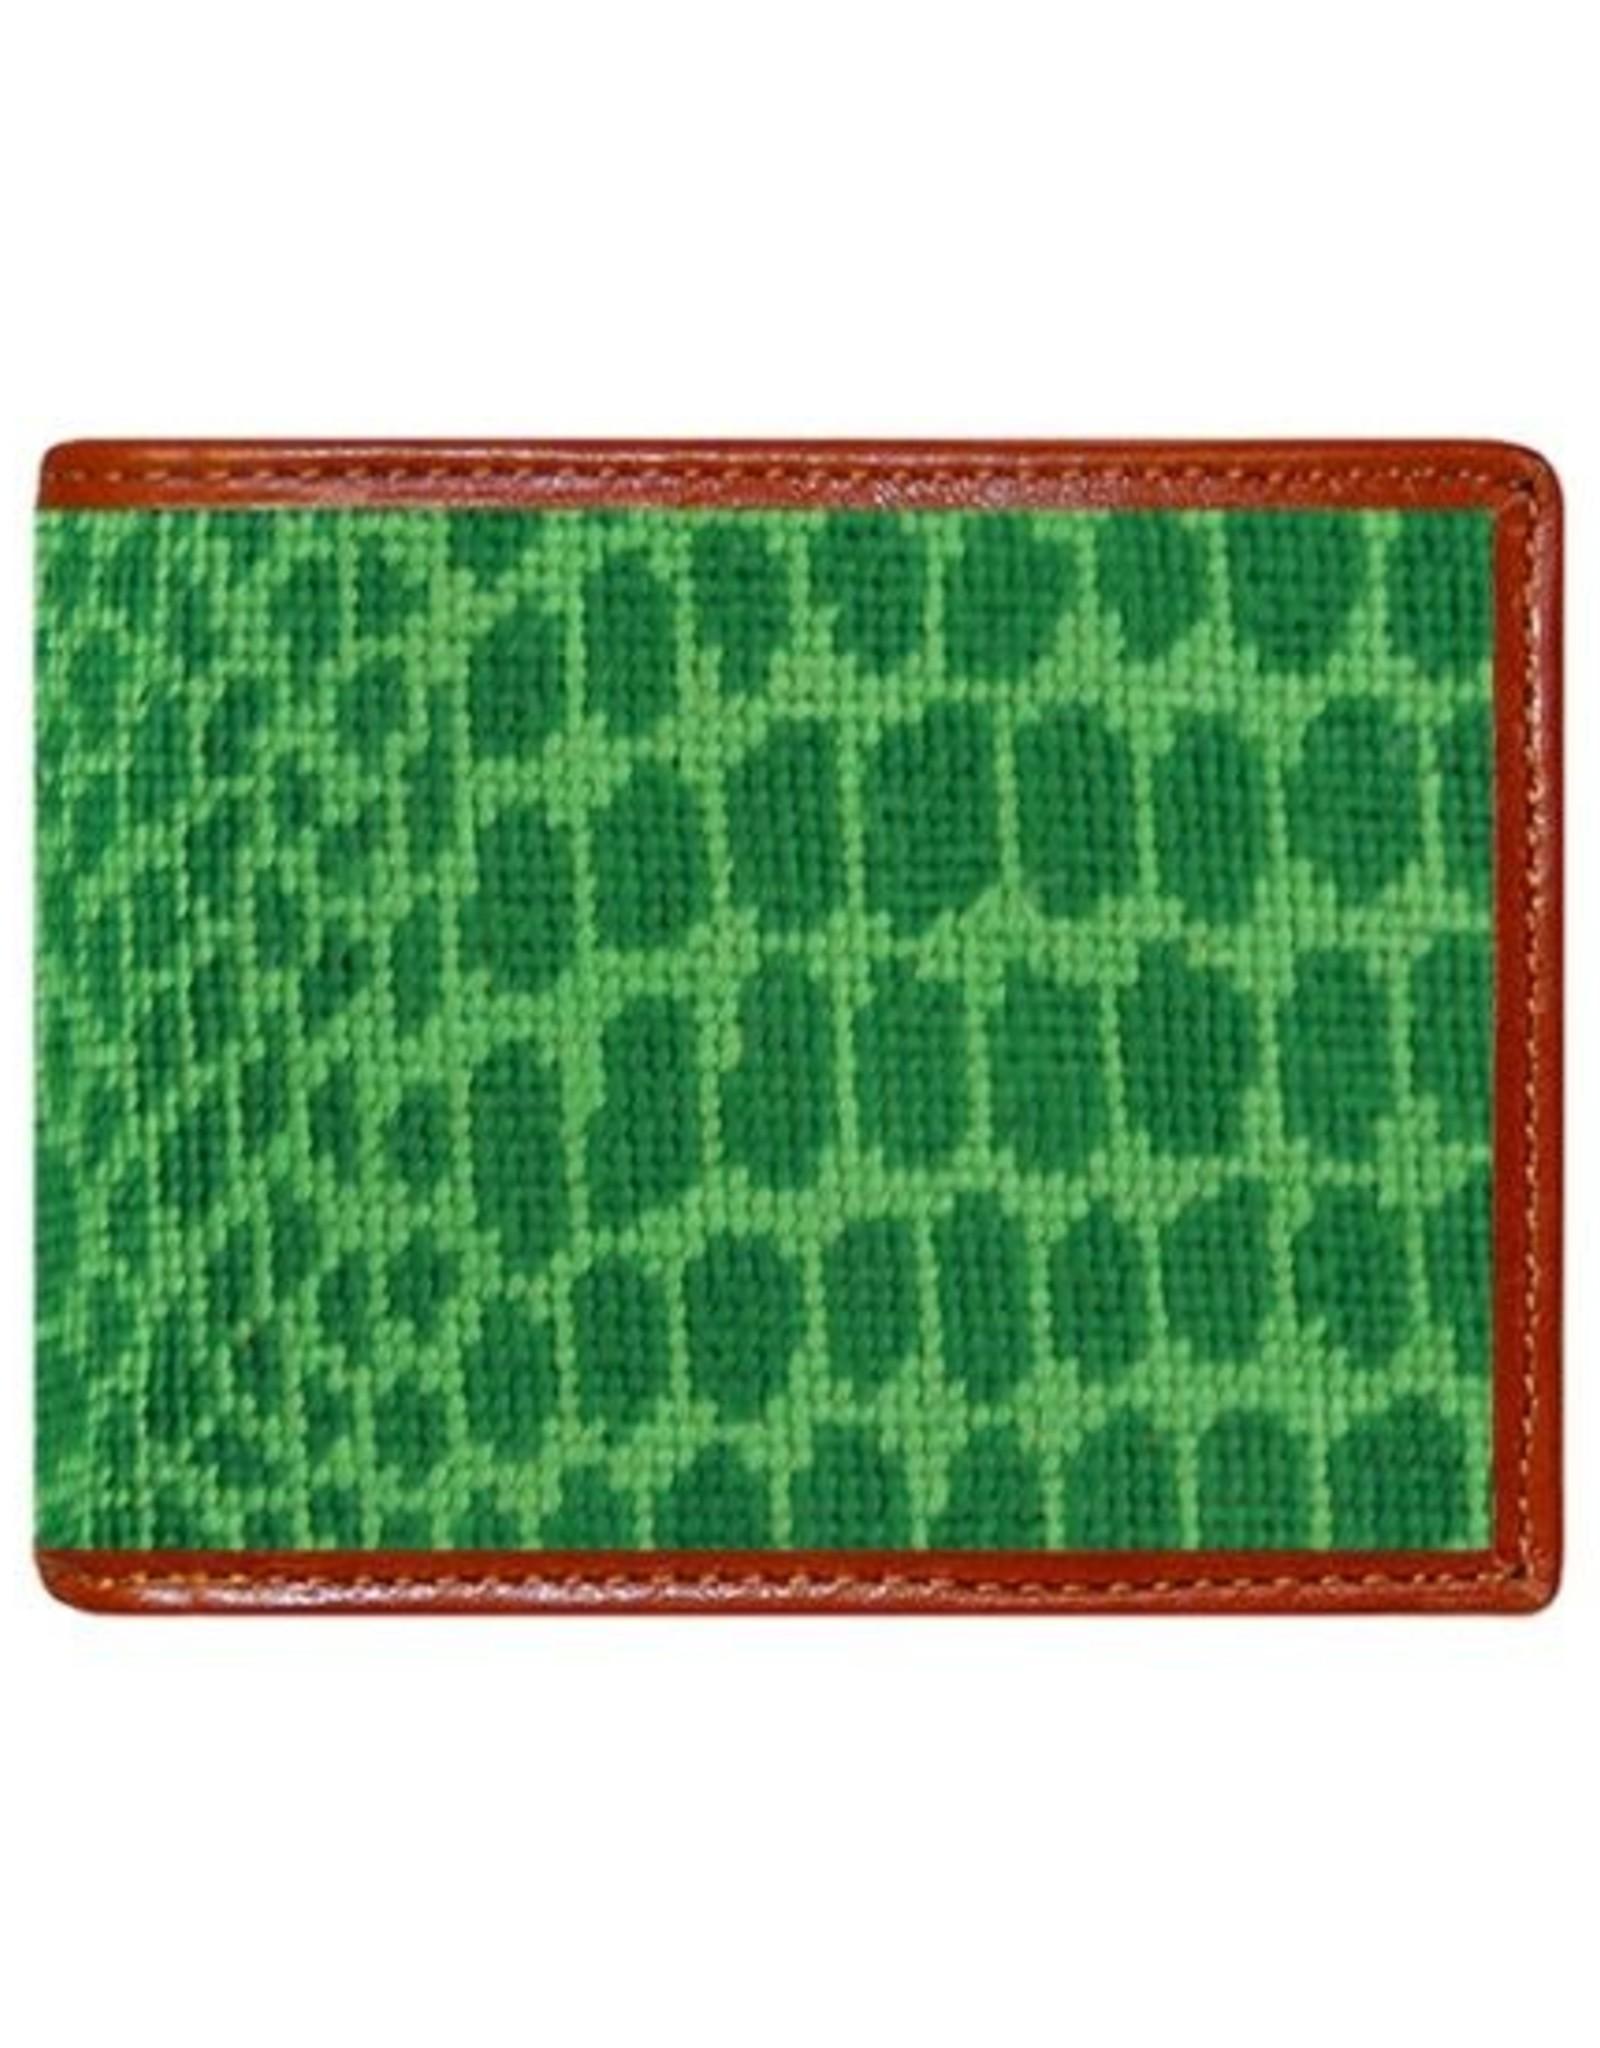 Smathers & Branson Alligator Skin Needlepoint Bi-Fold Wallet